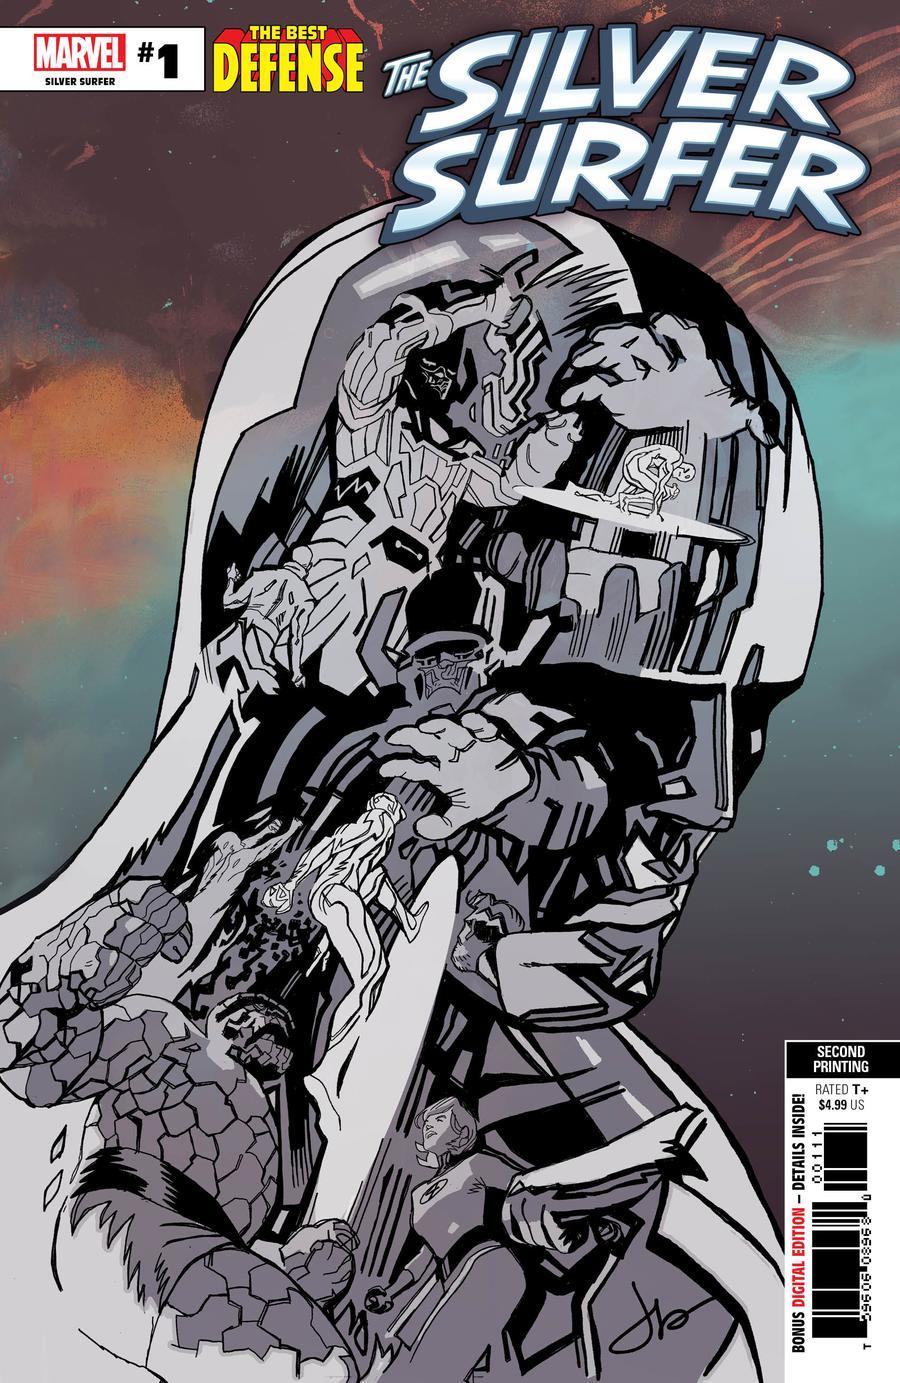 Defenders Silver Surfer #1 Cover F 2nd Ptg Variant Jason Latour Cover (Best Defense Part 4)